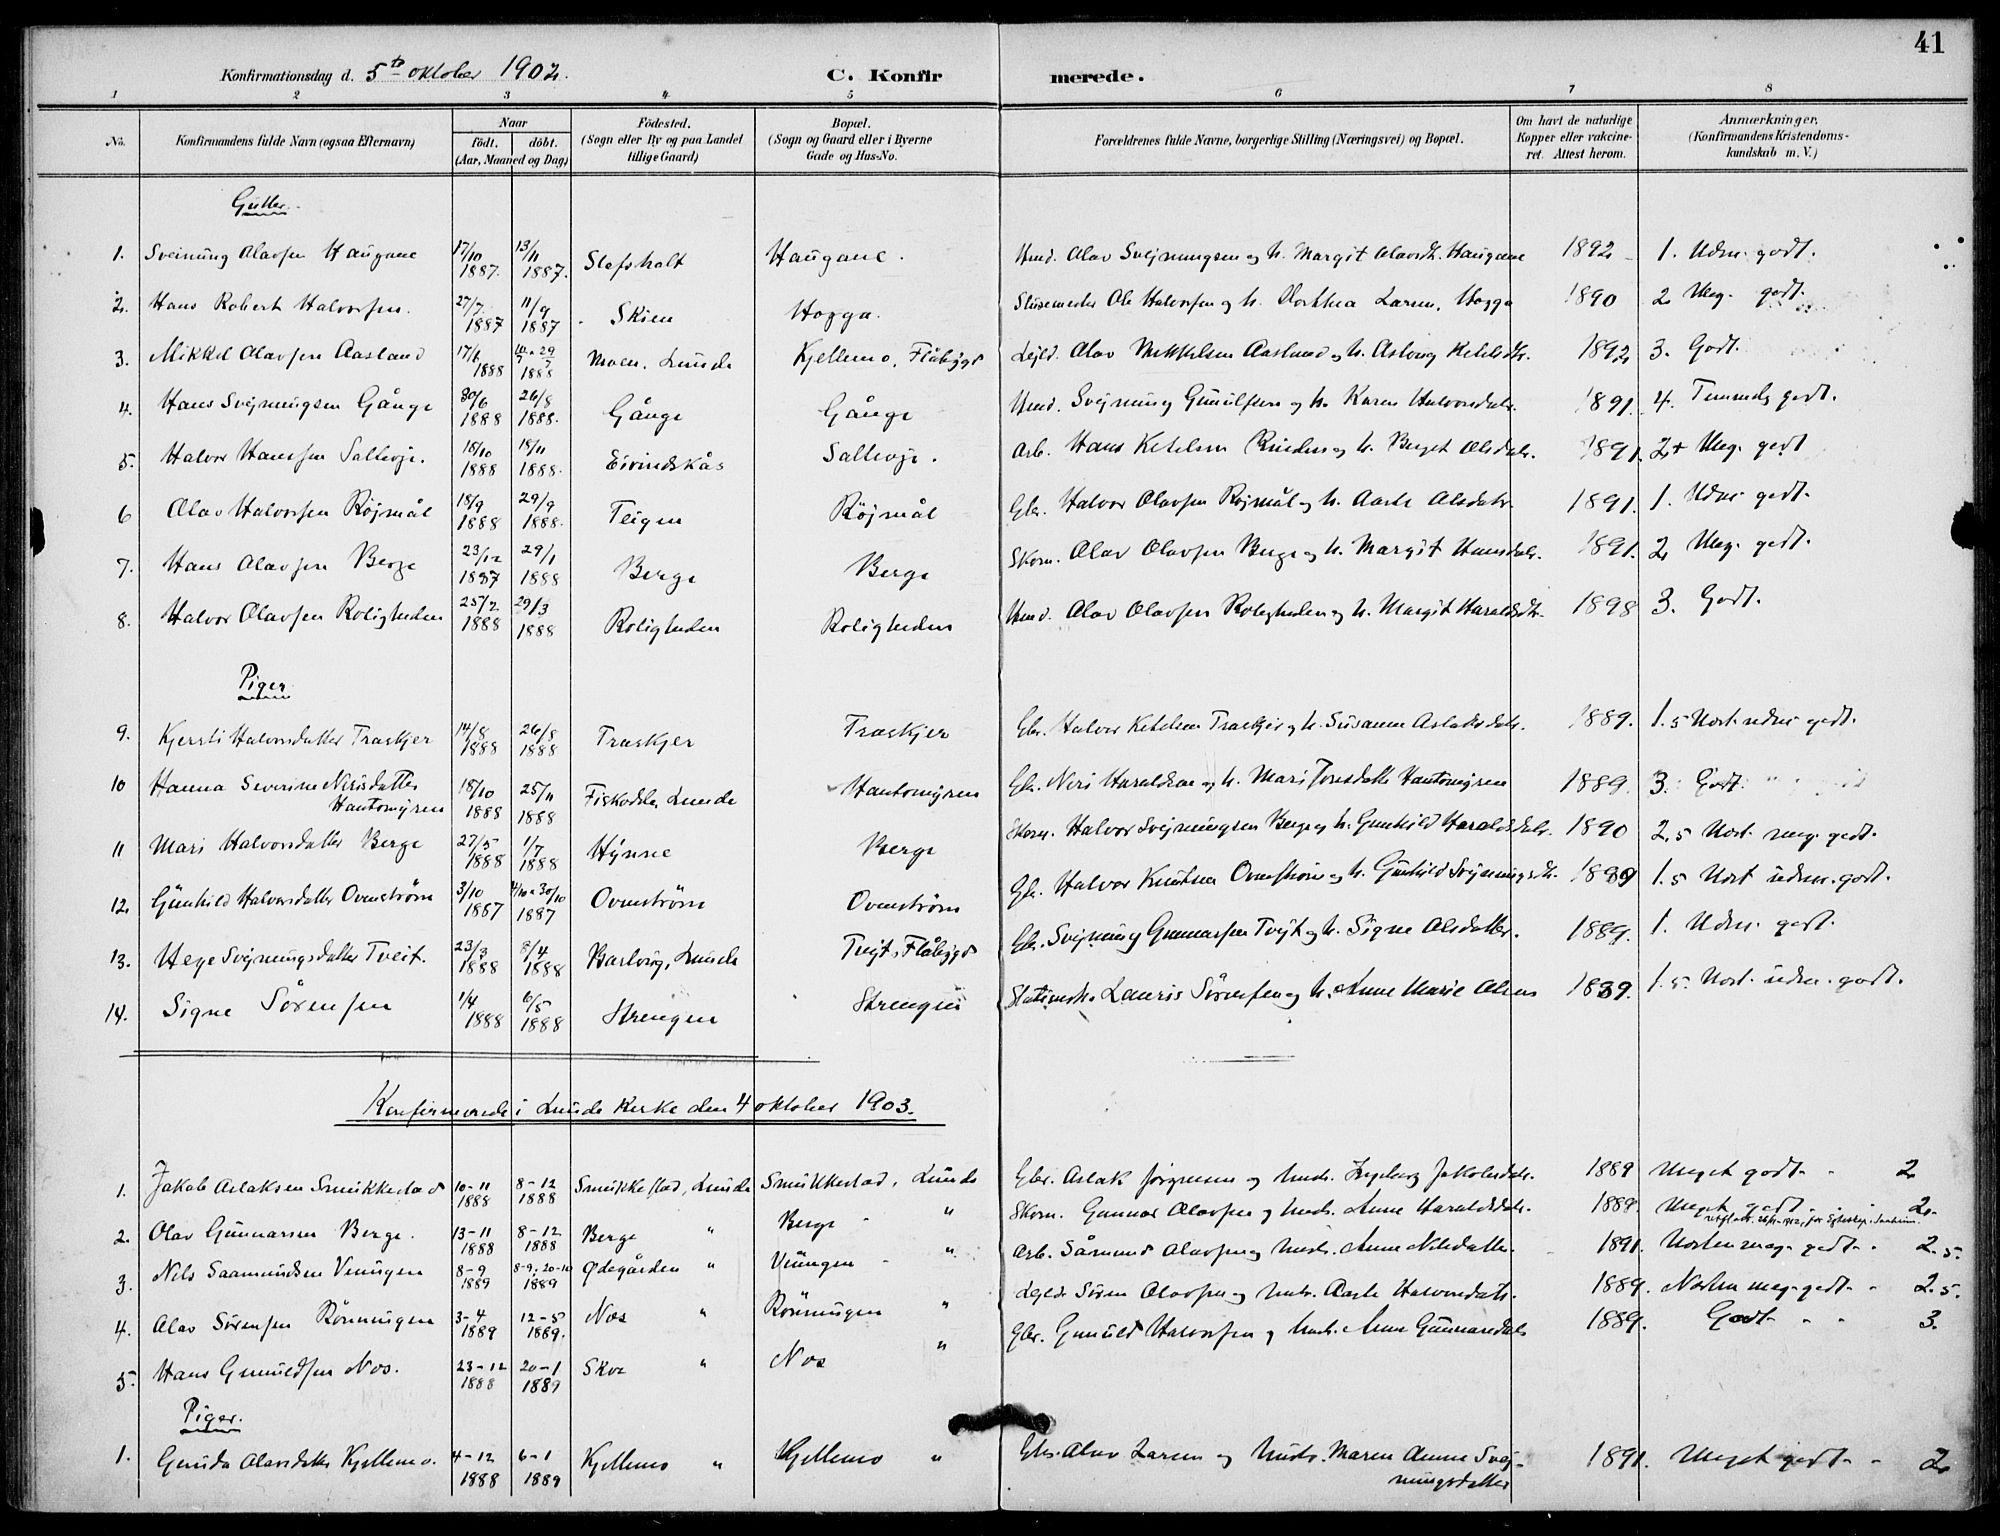 SAKO, Lunde kirkebøker, F/Fb/L0004: Ministerialbok nr. II 4, 1892-1907, s. 41